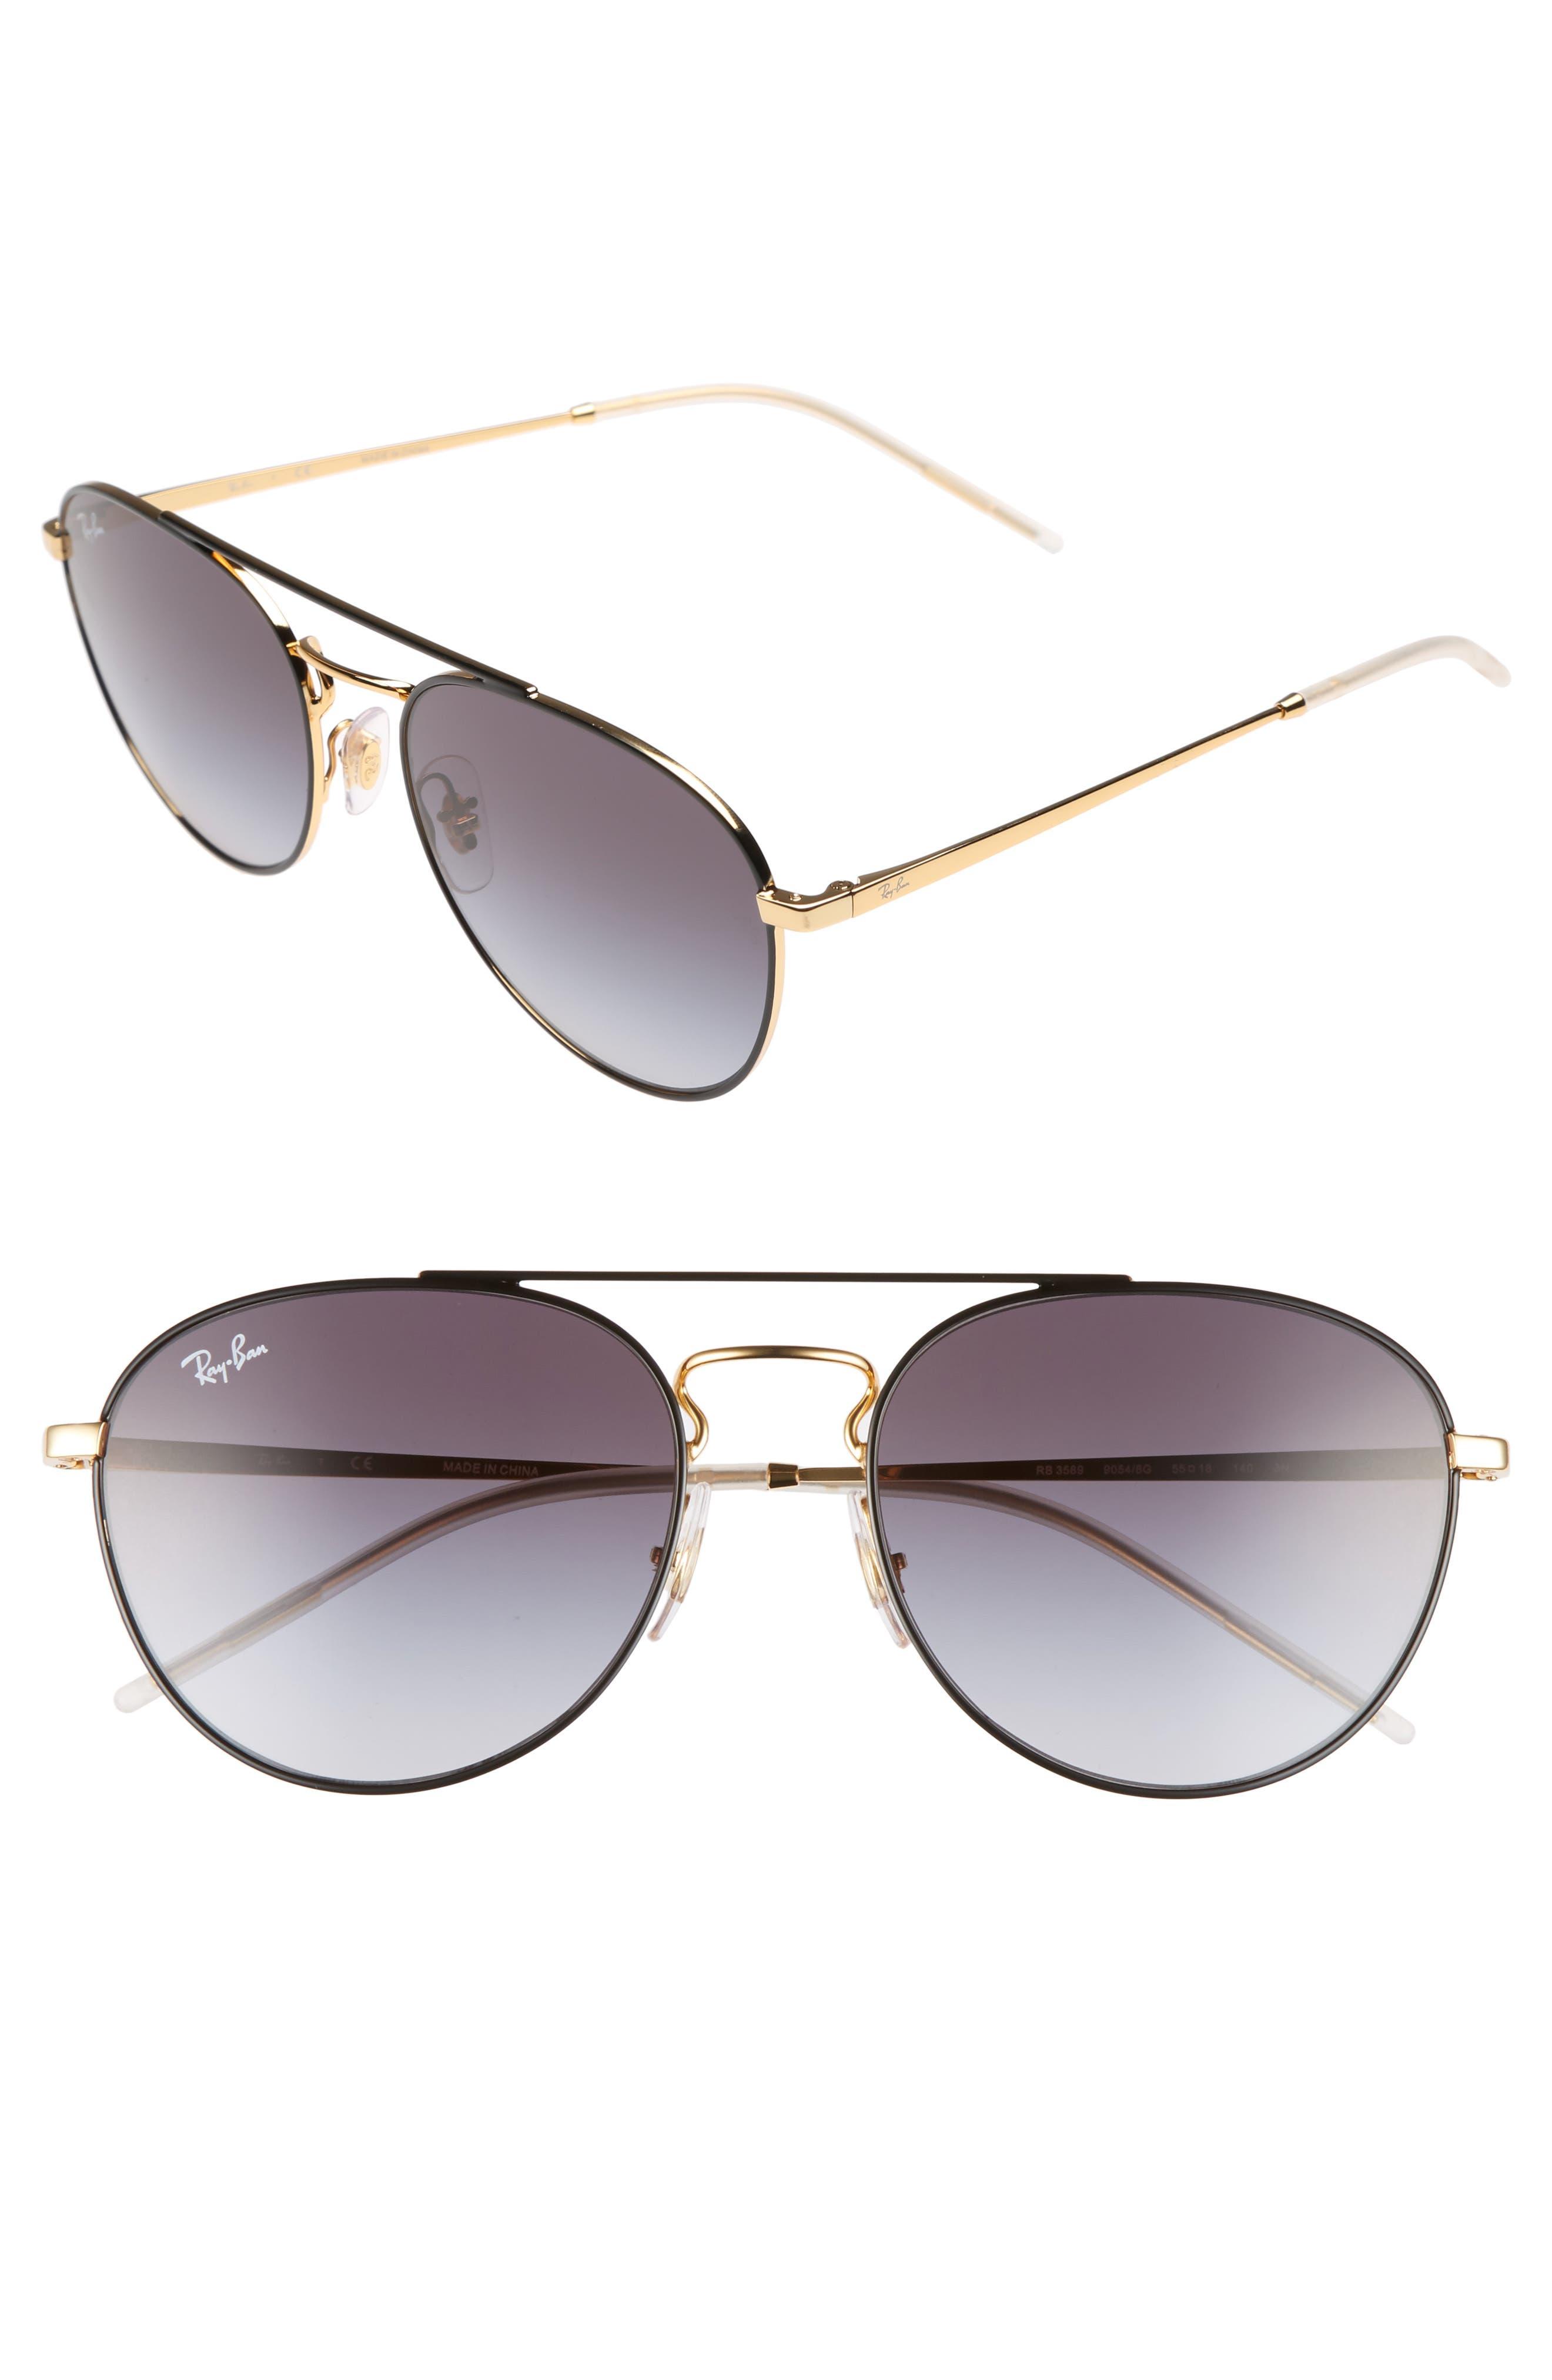 55mm Gradient Lens Round Aviator Sunglasses,                             Alternate thumbnail 2, color,                             001